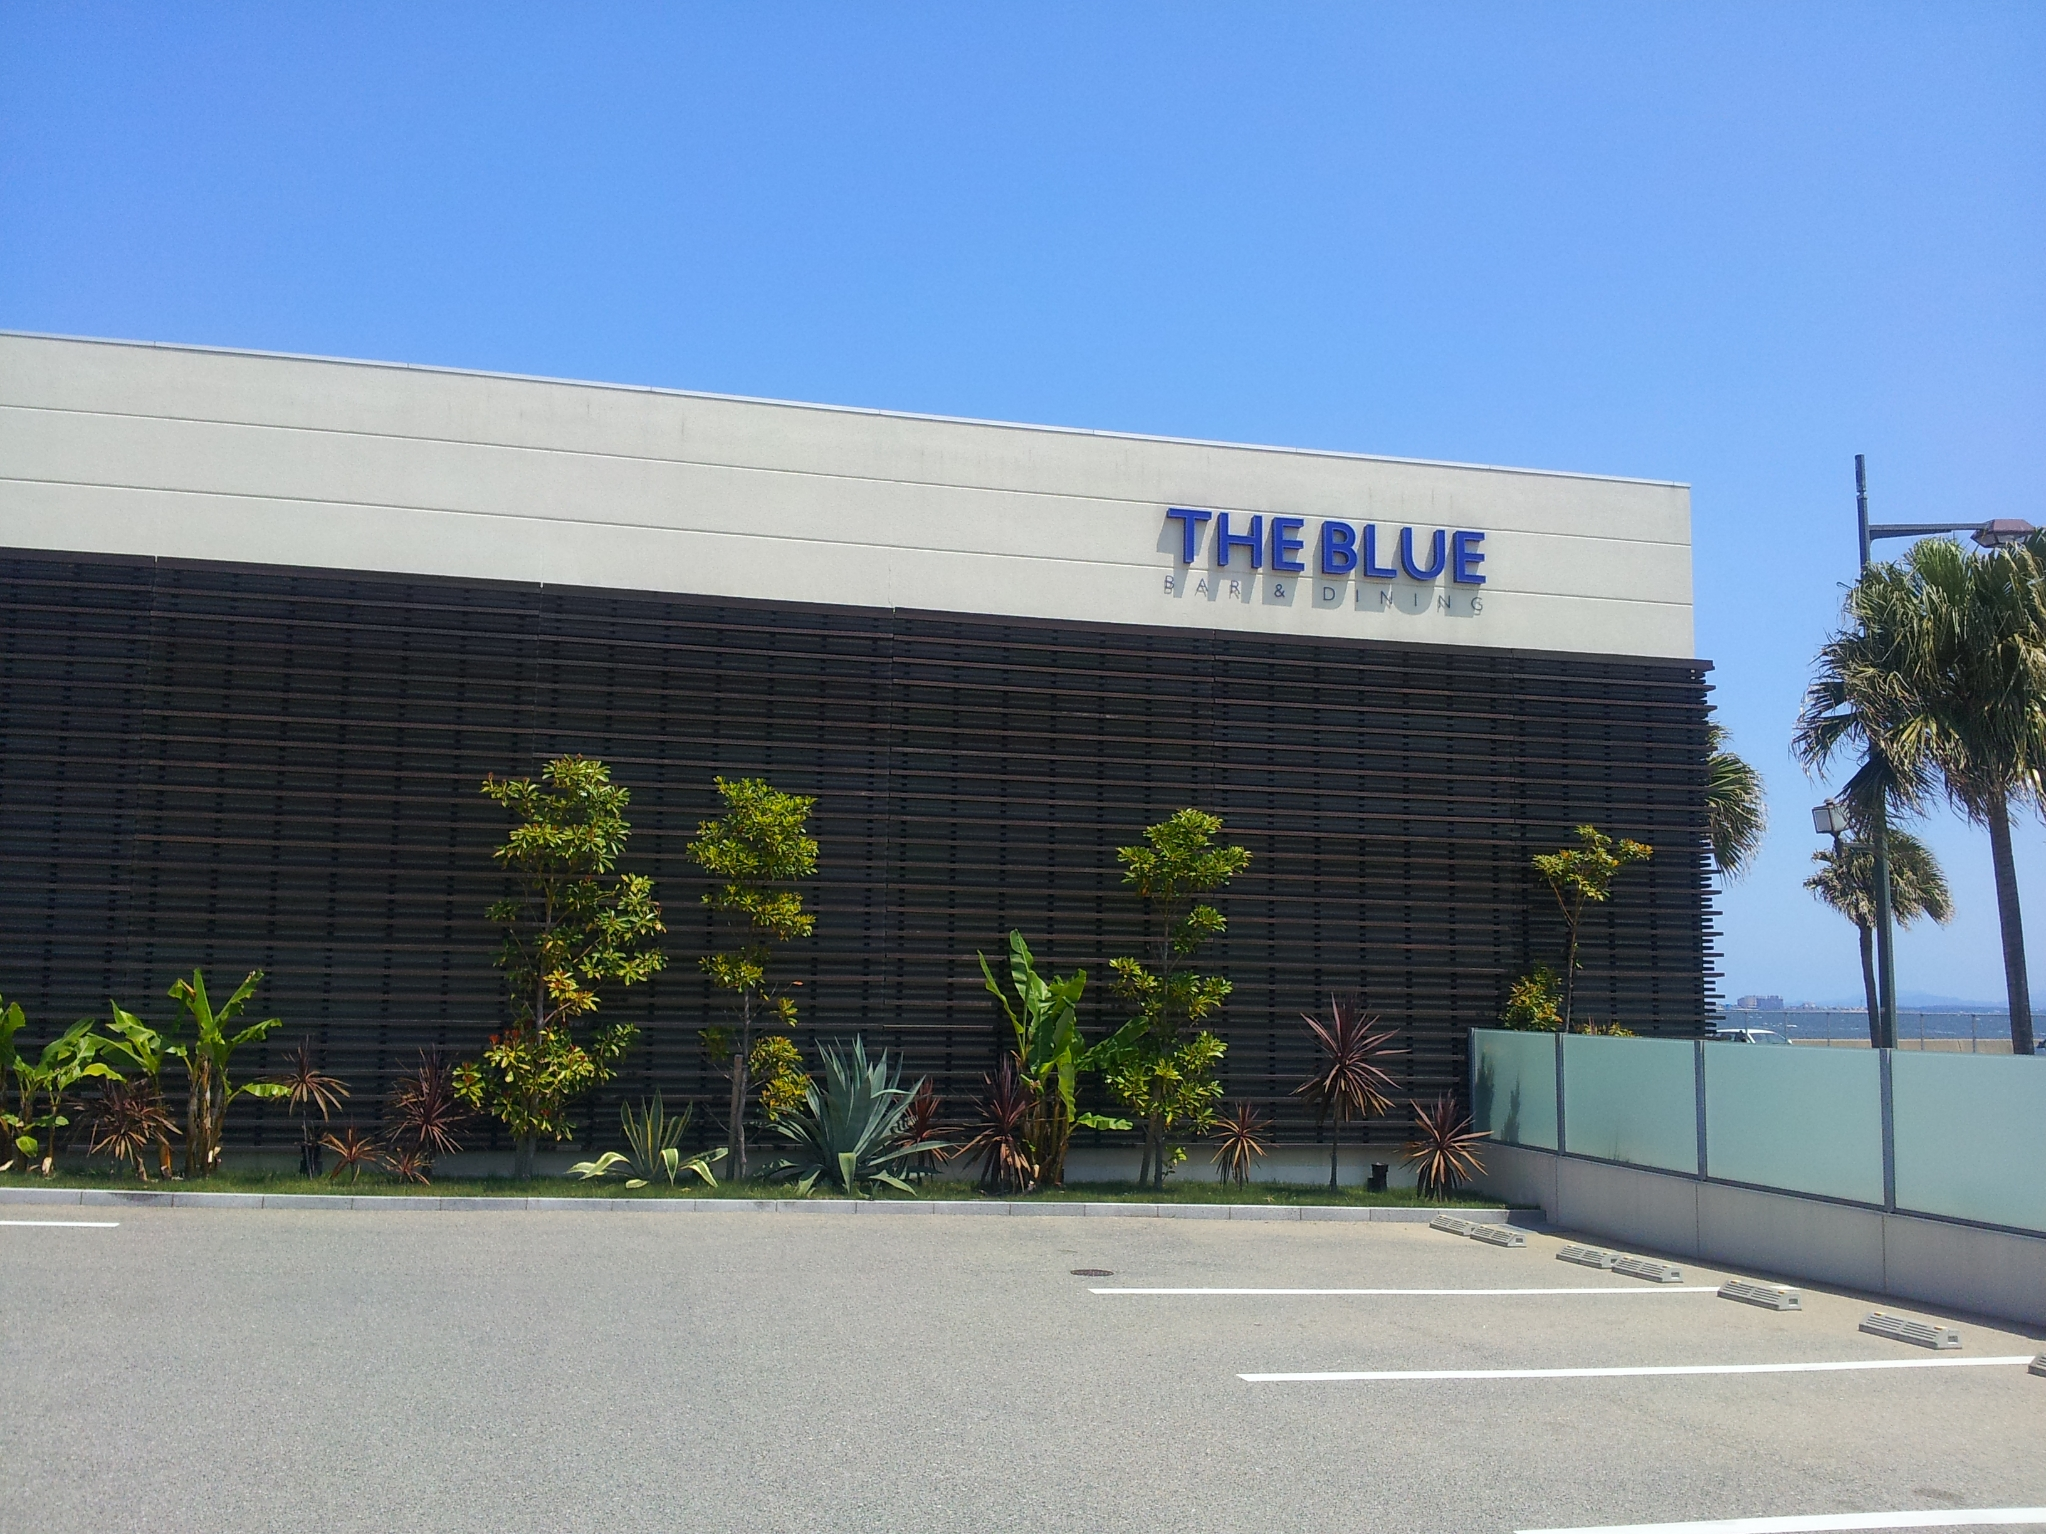 THE BULE